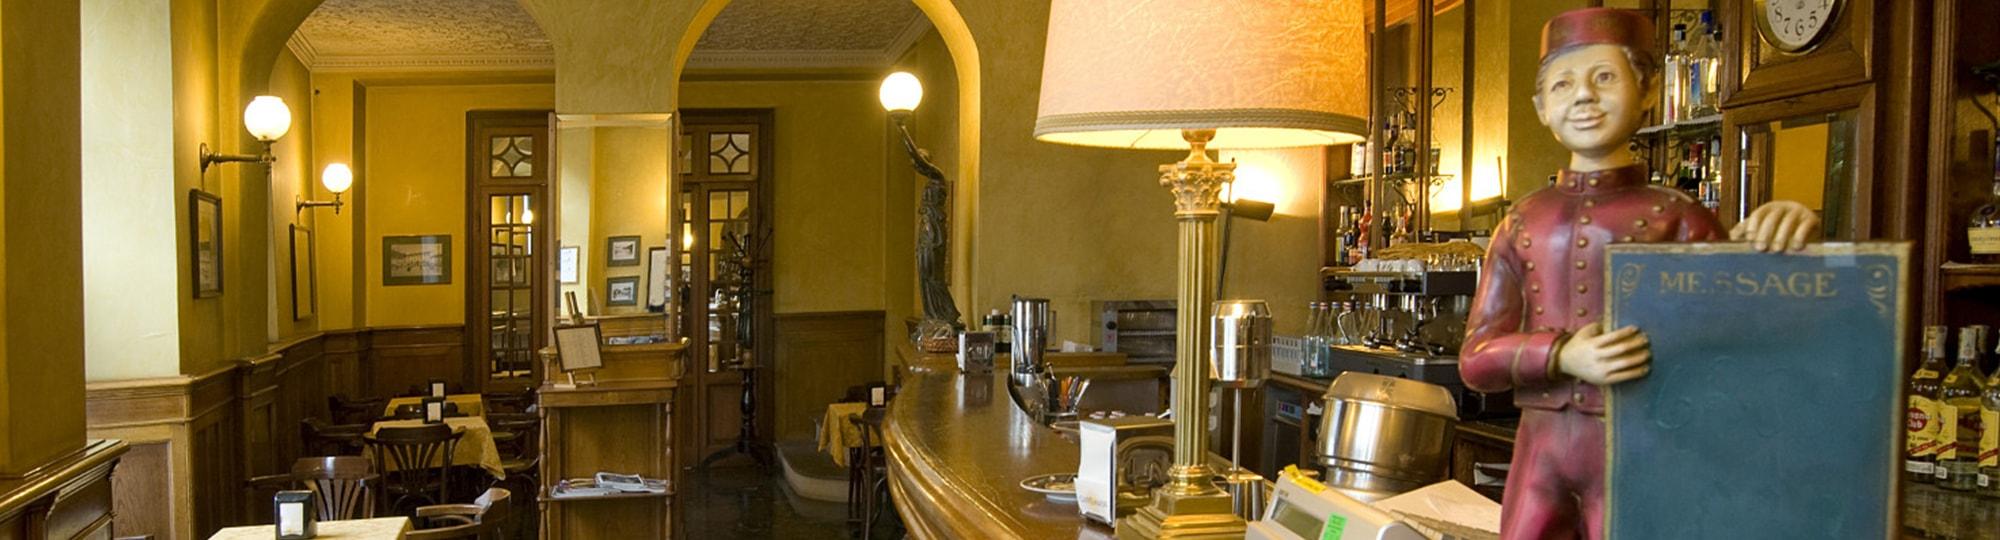 Vue de l'hotel Le Due Corti 4* à Como